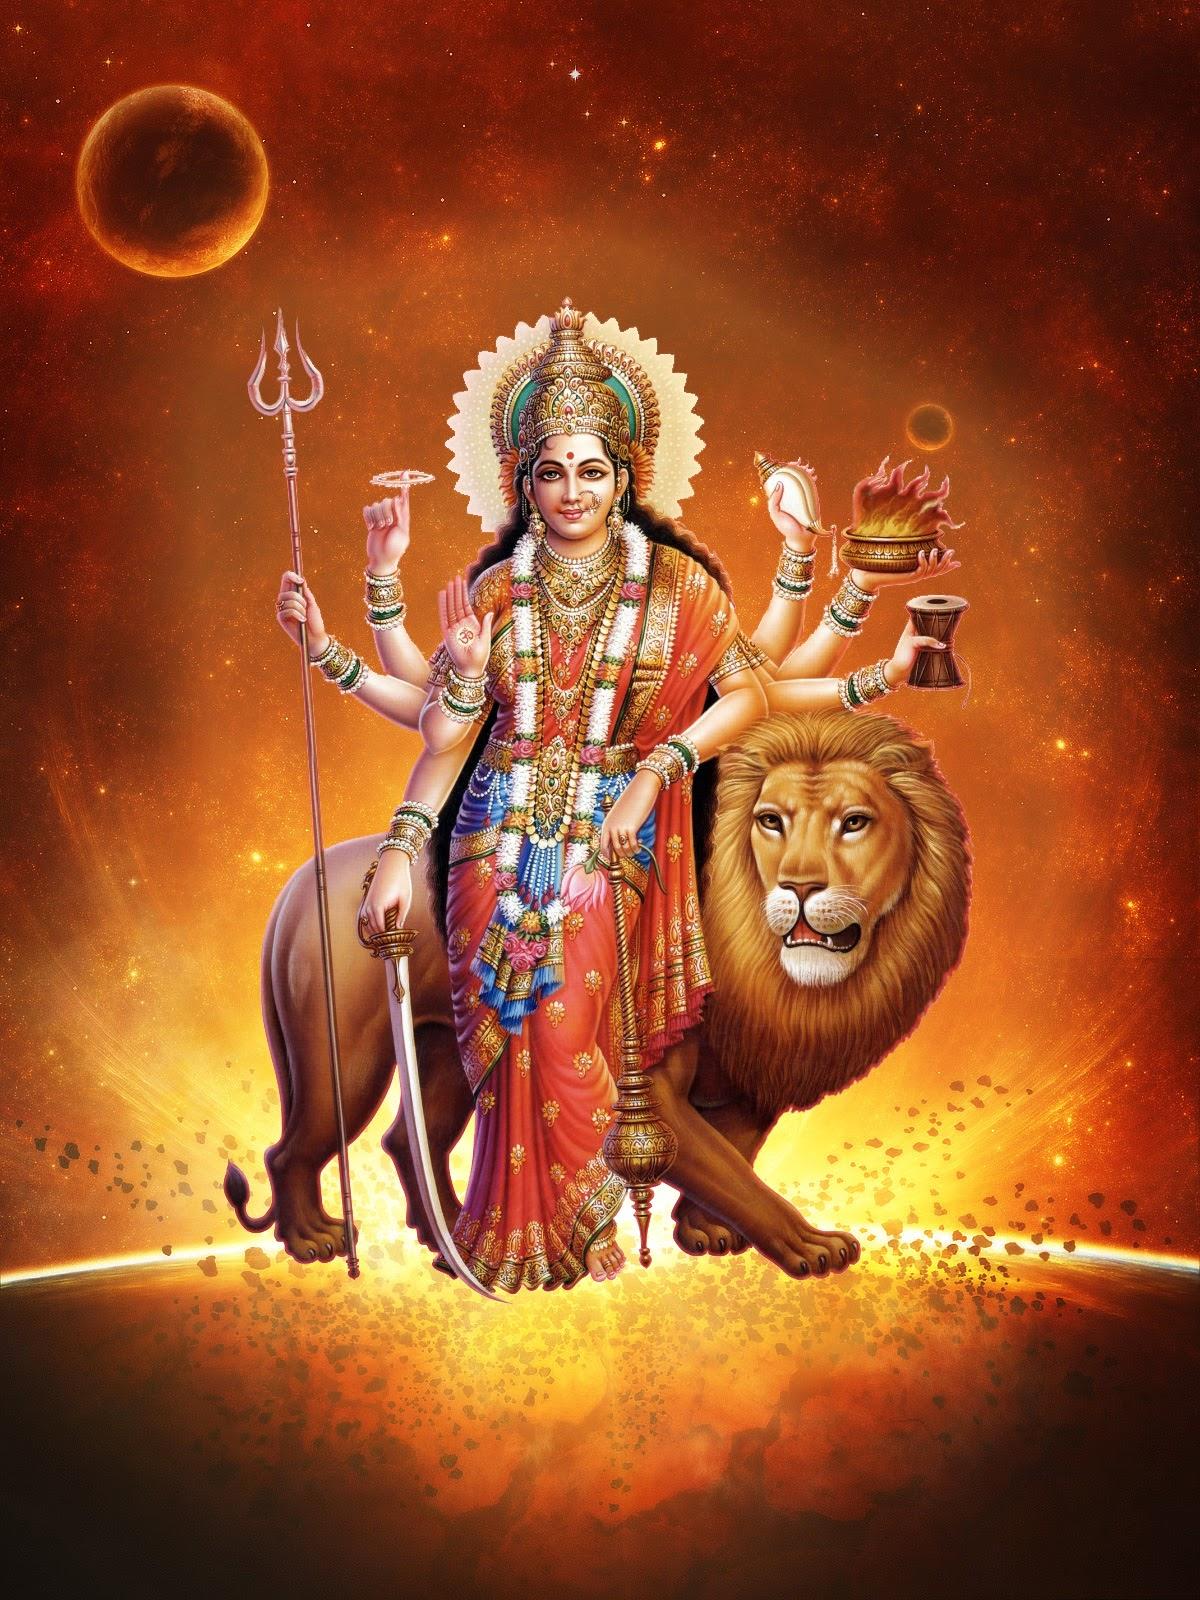 Panchmukhi Ganesh Wallpaper Hd Goddess Maa Durga Devi Hd Wallpapers Images Pictures